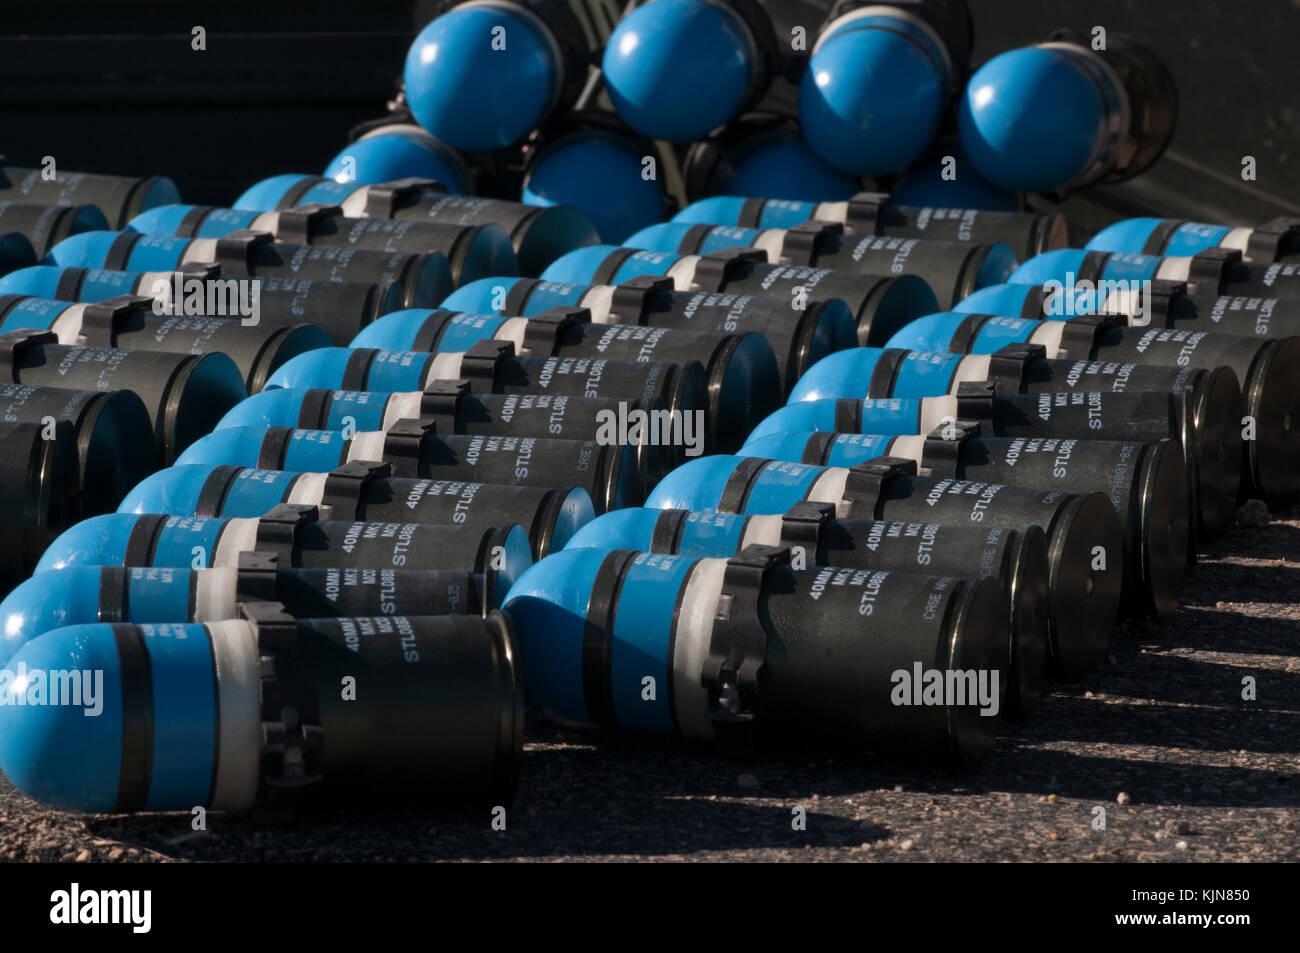 Mark 19 grenades - Stock Image